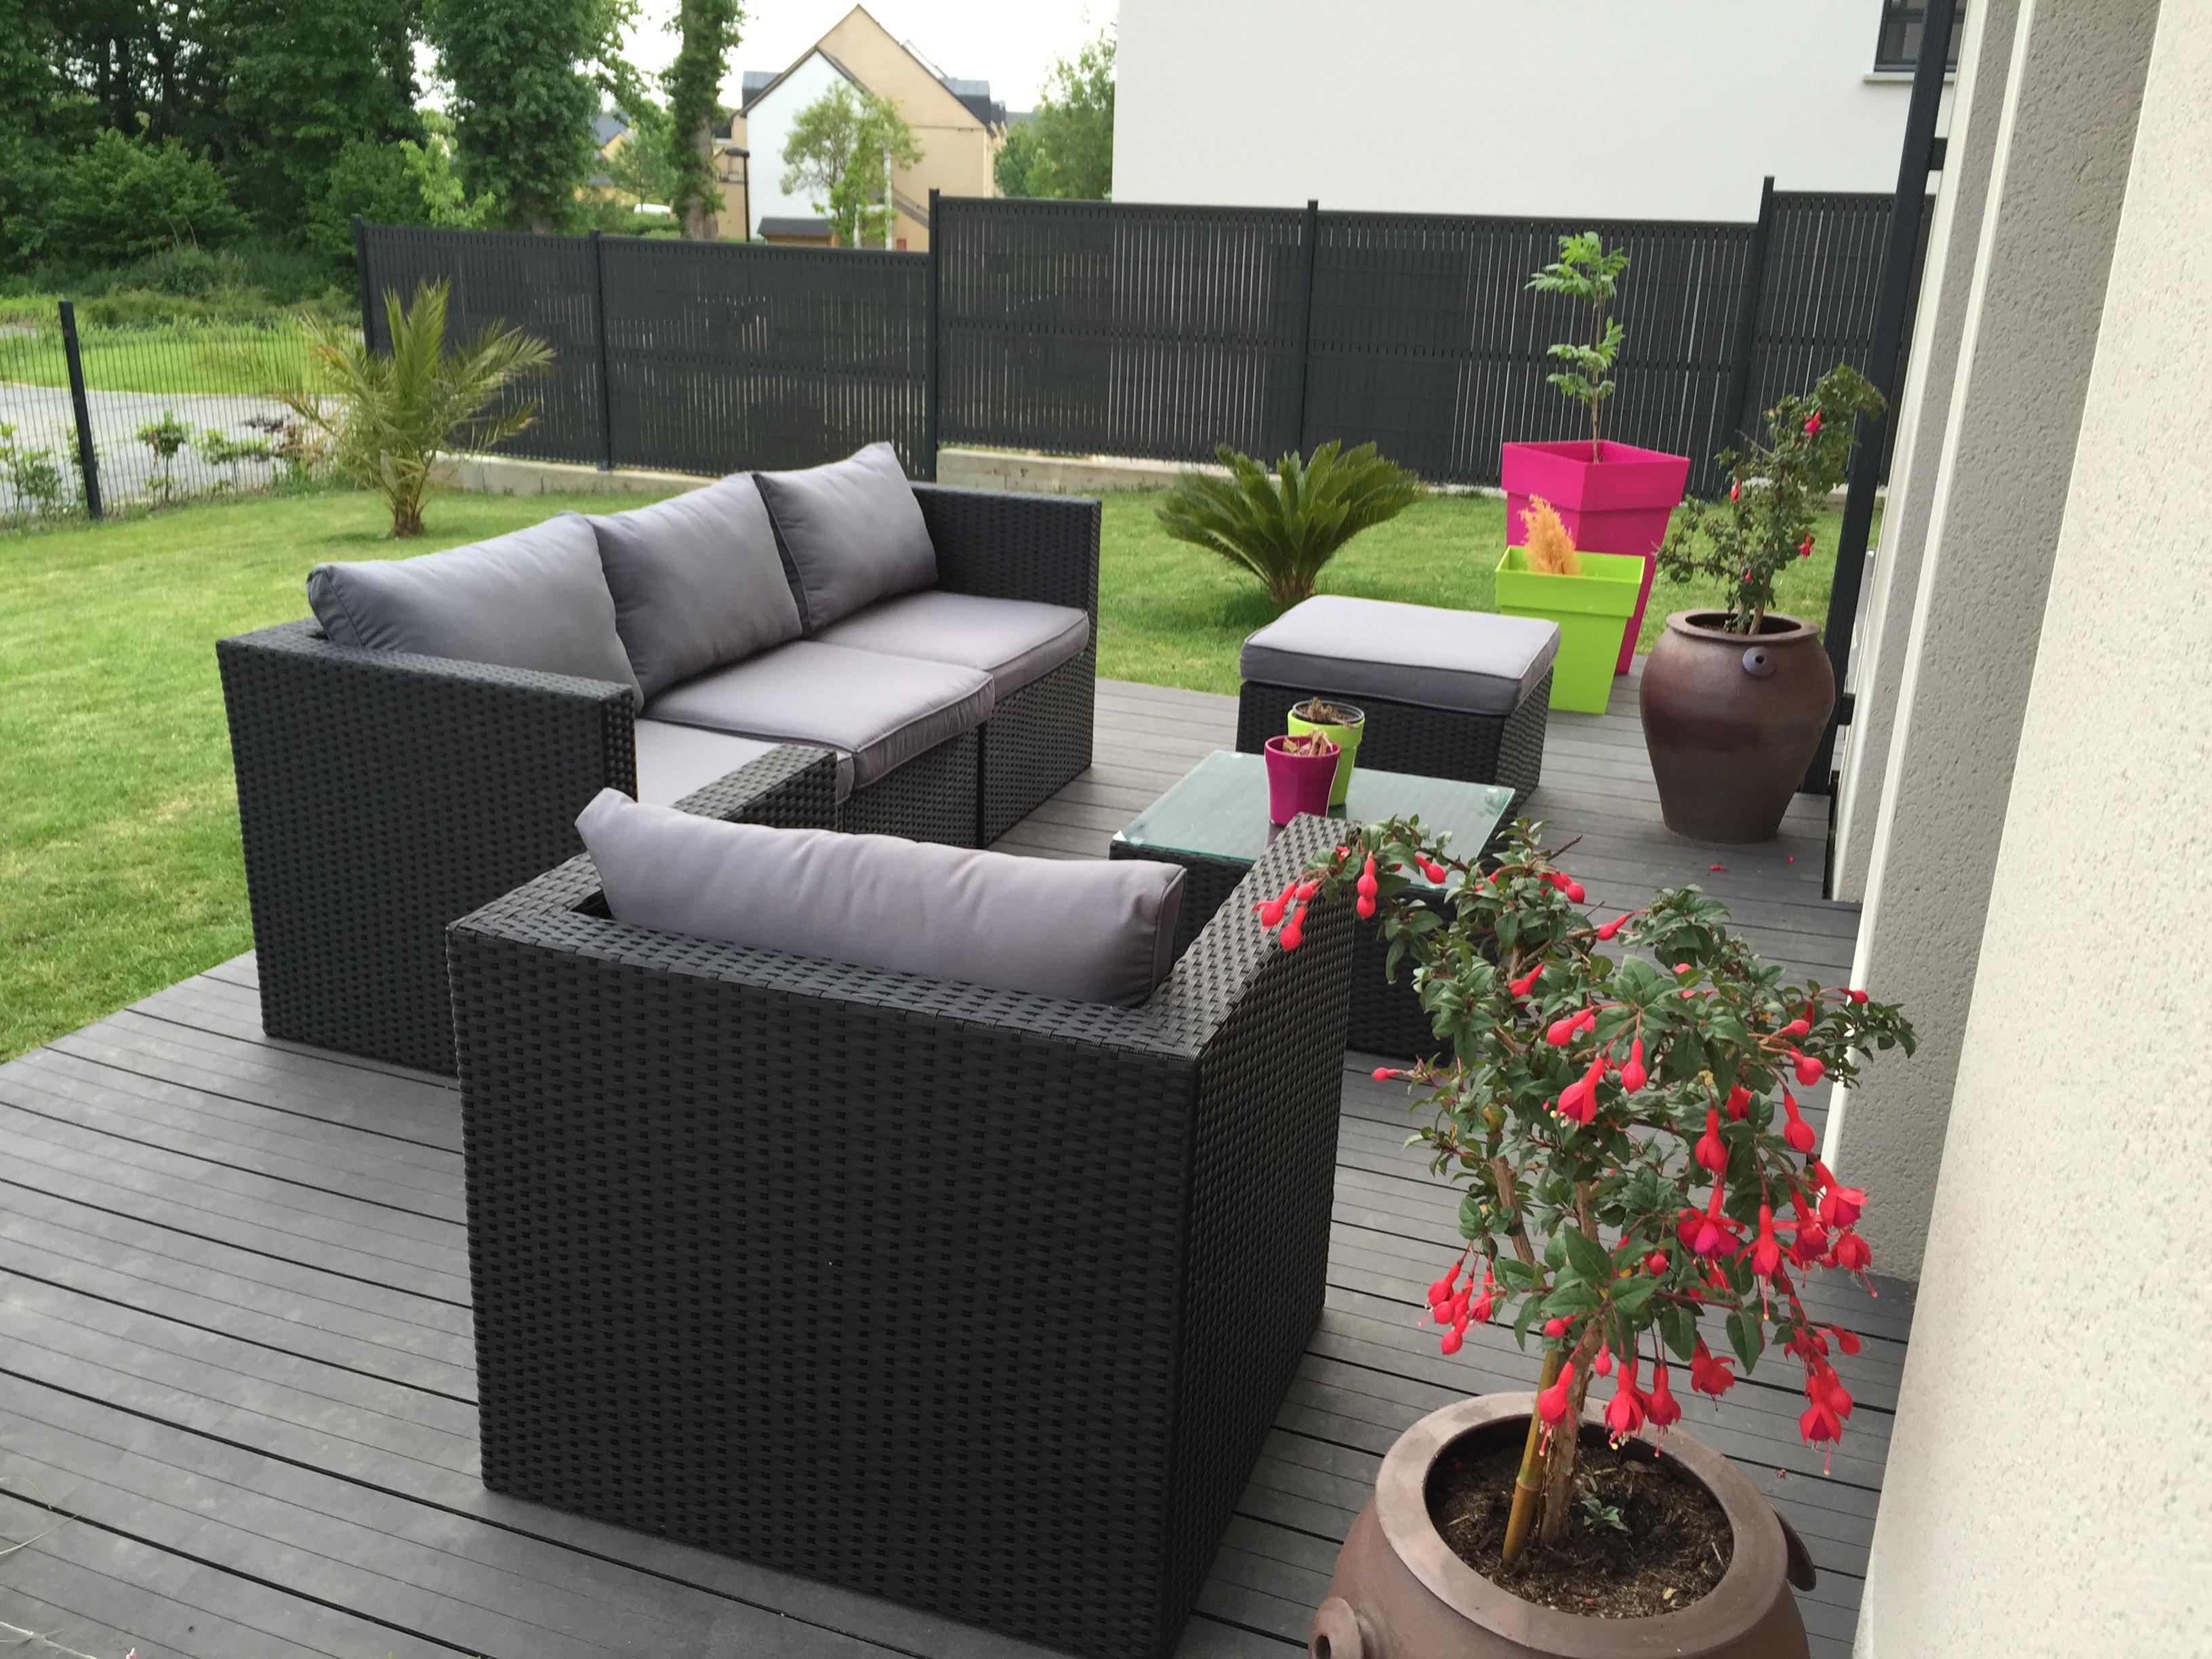 salon de jardin 5 places - benito